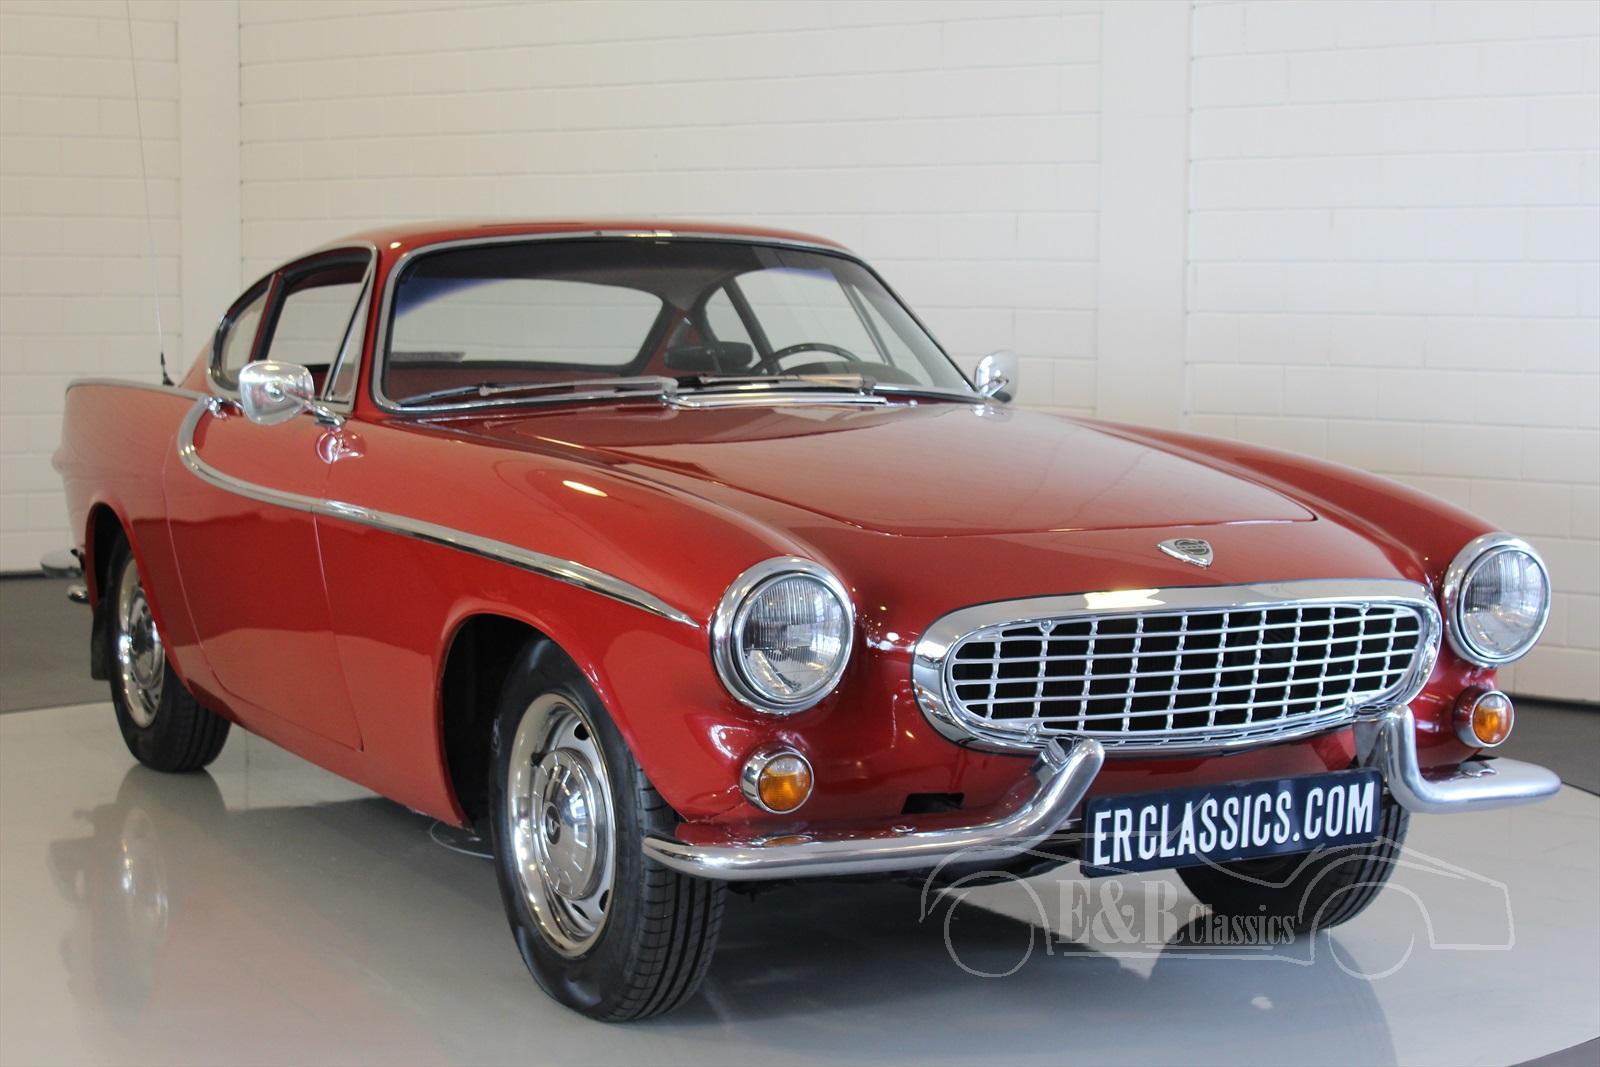 Swedish Classic Cars Erclassics Com Sweden Classic Car